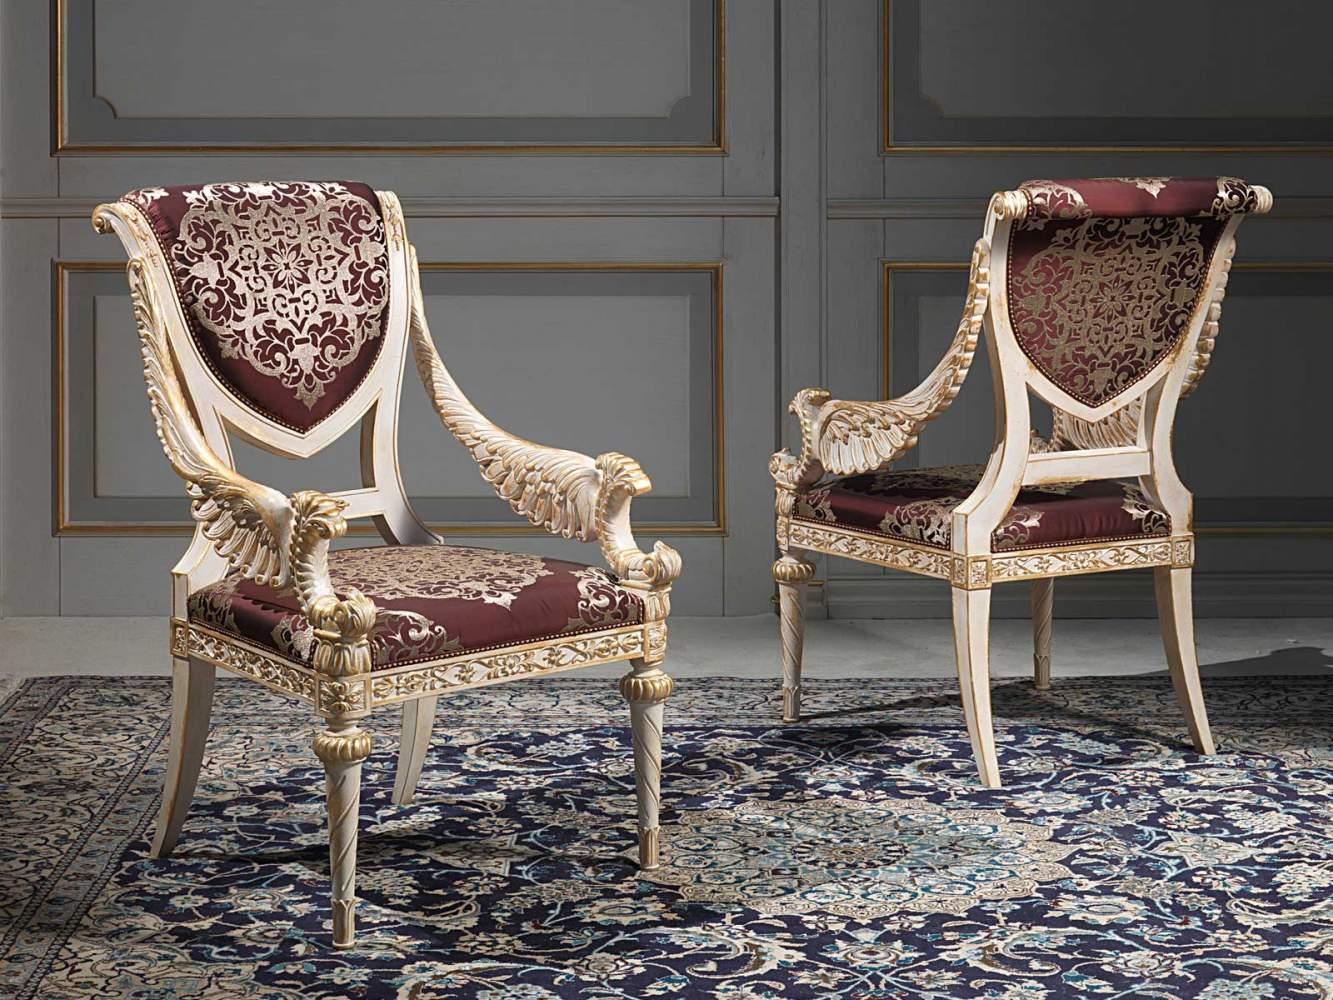 Chairs Louis XVI style